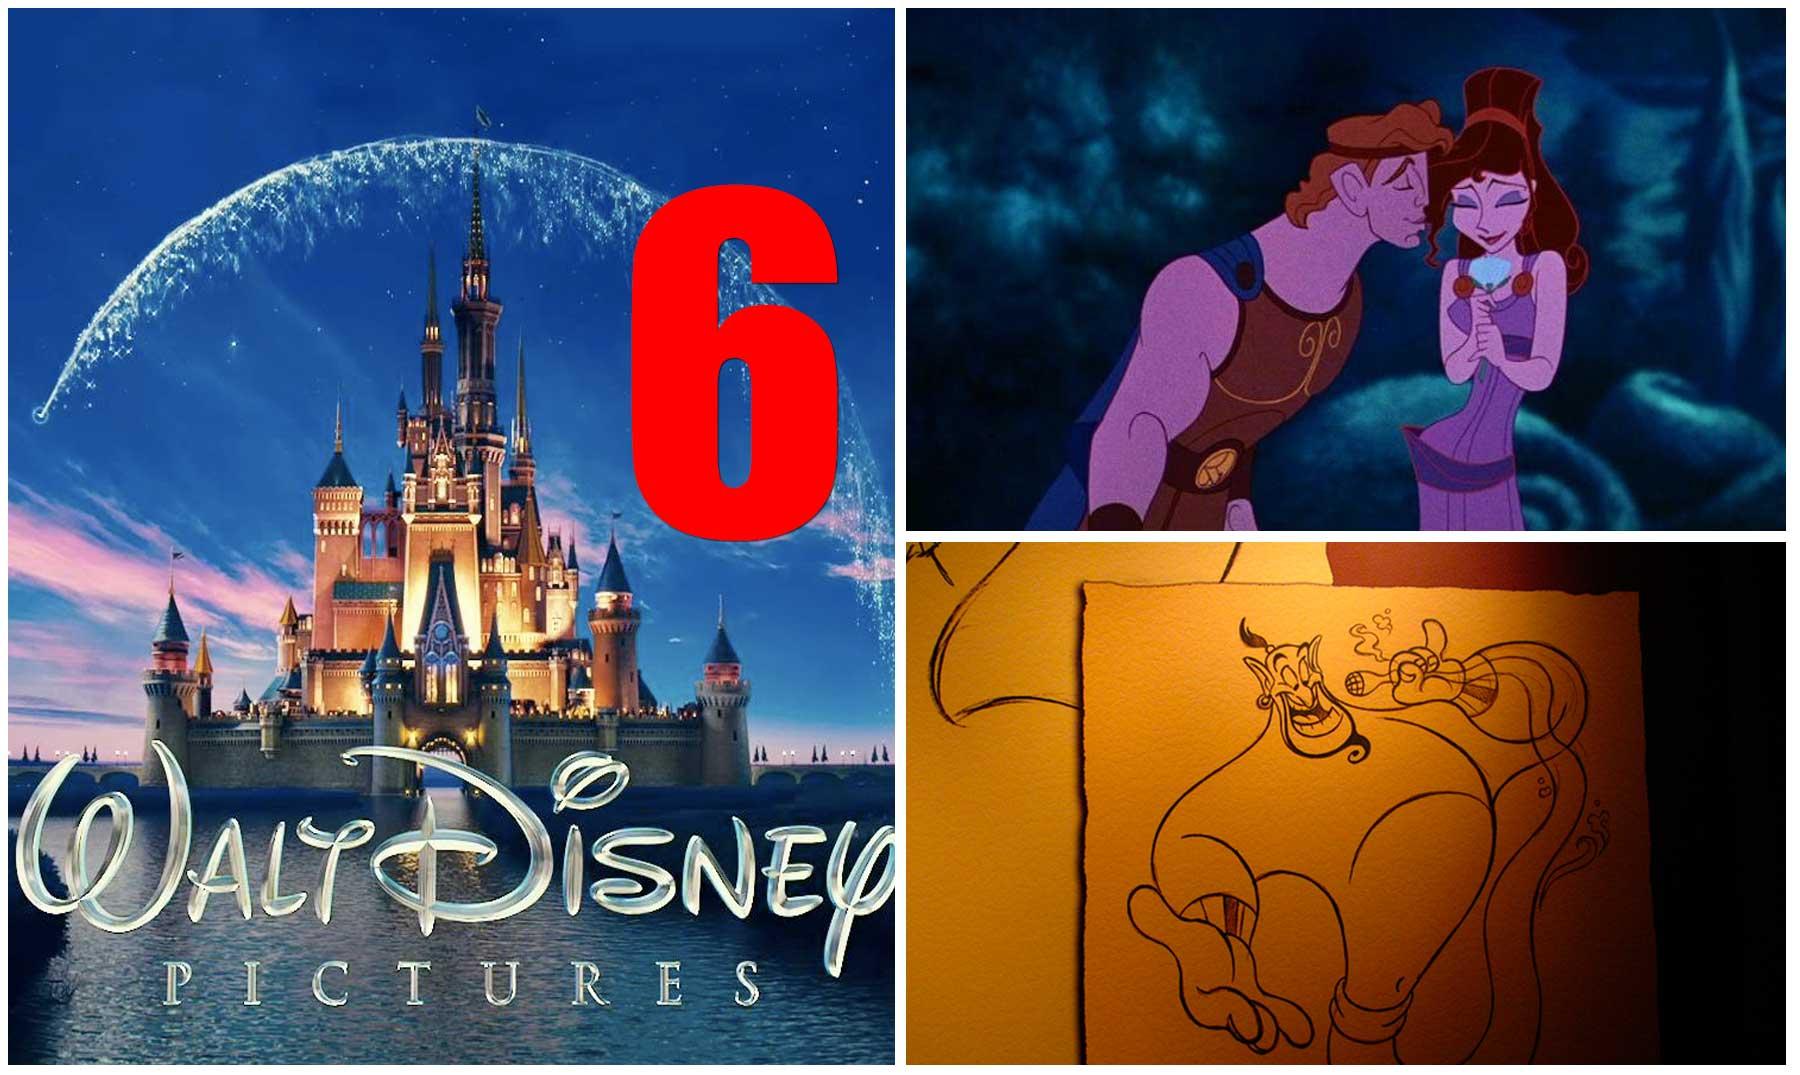 Caracteres del canal de Disney que tienen sexo